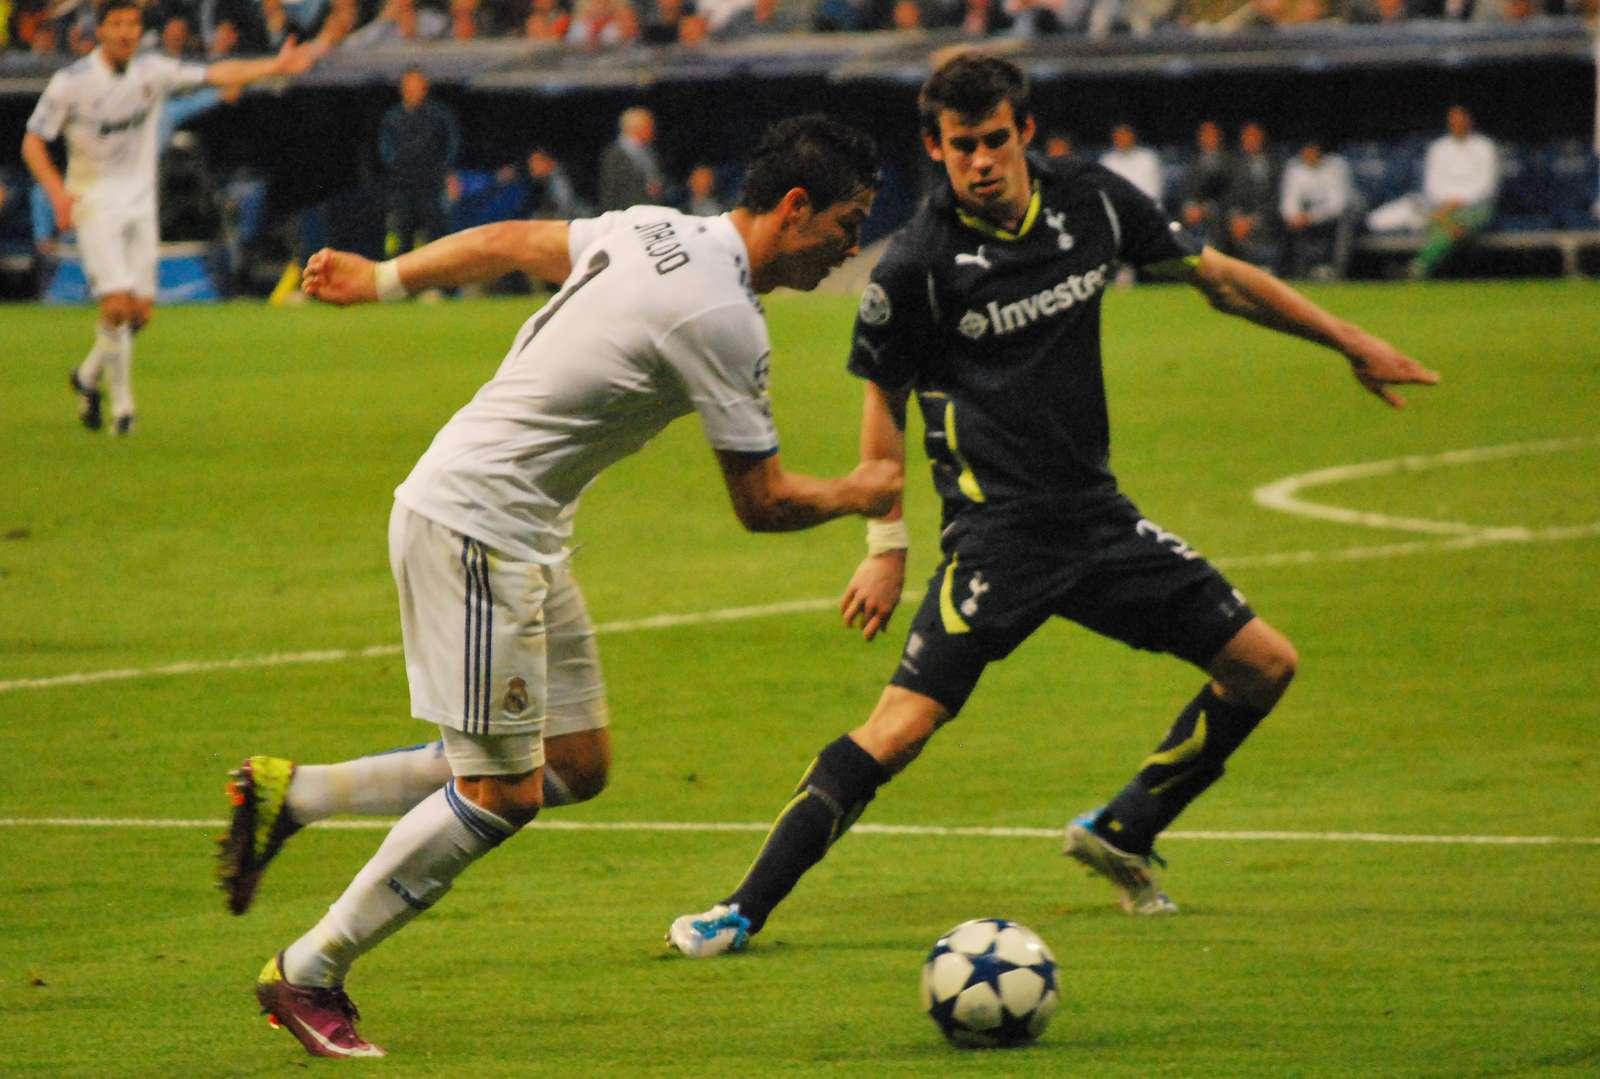 Ronaldo_Bale - joueurs de football